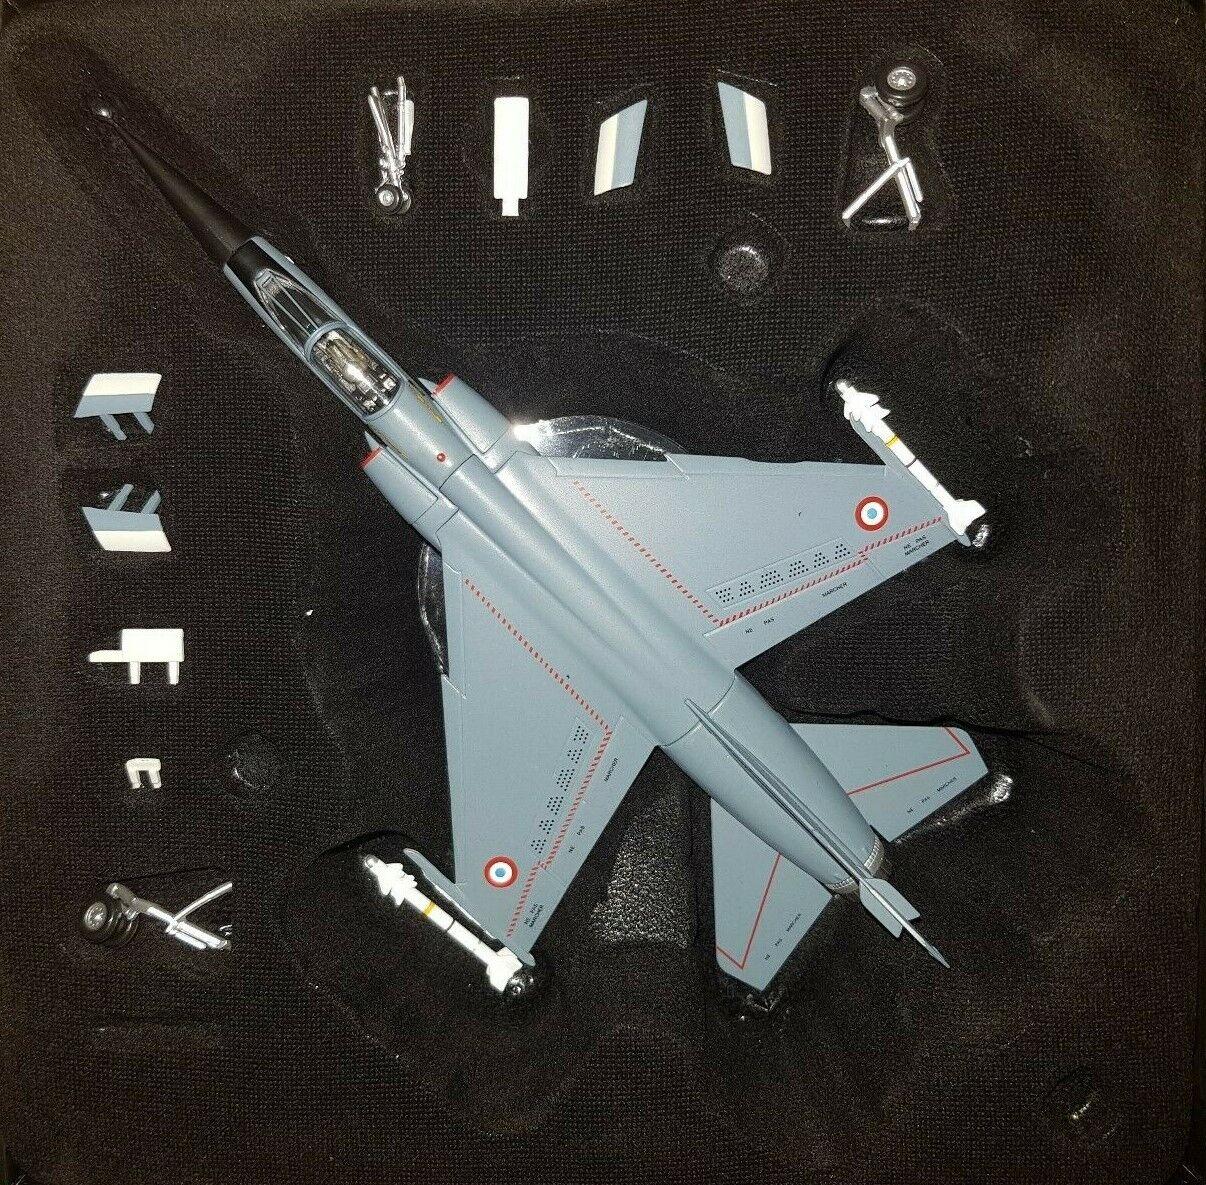 Premium X Dassault Mirage f1c Esercito de l'Air 'Luftwaffe Francia 1 72 mettuttio